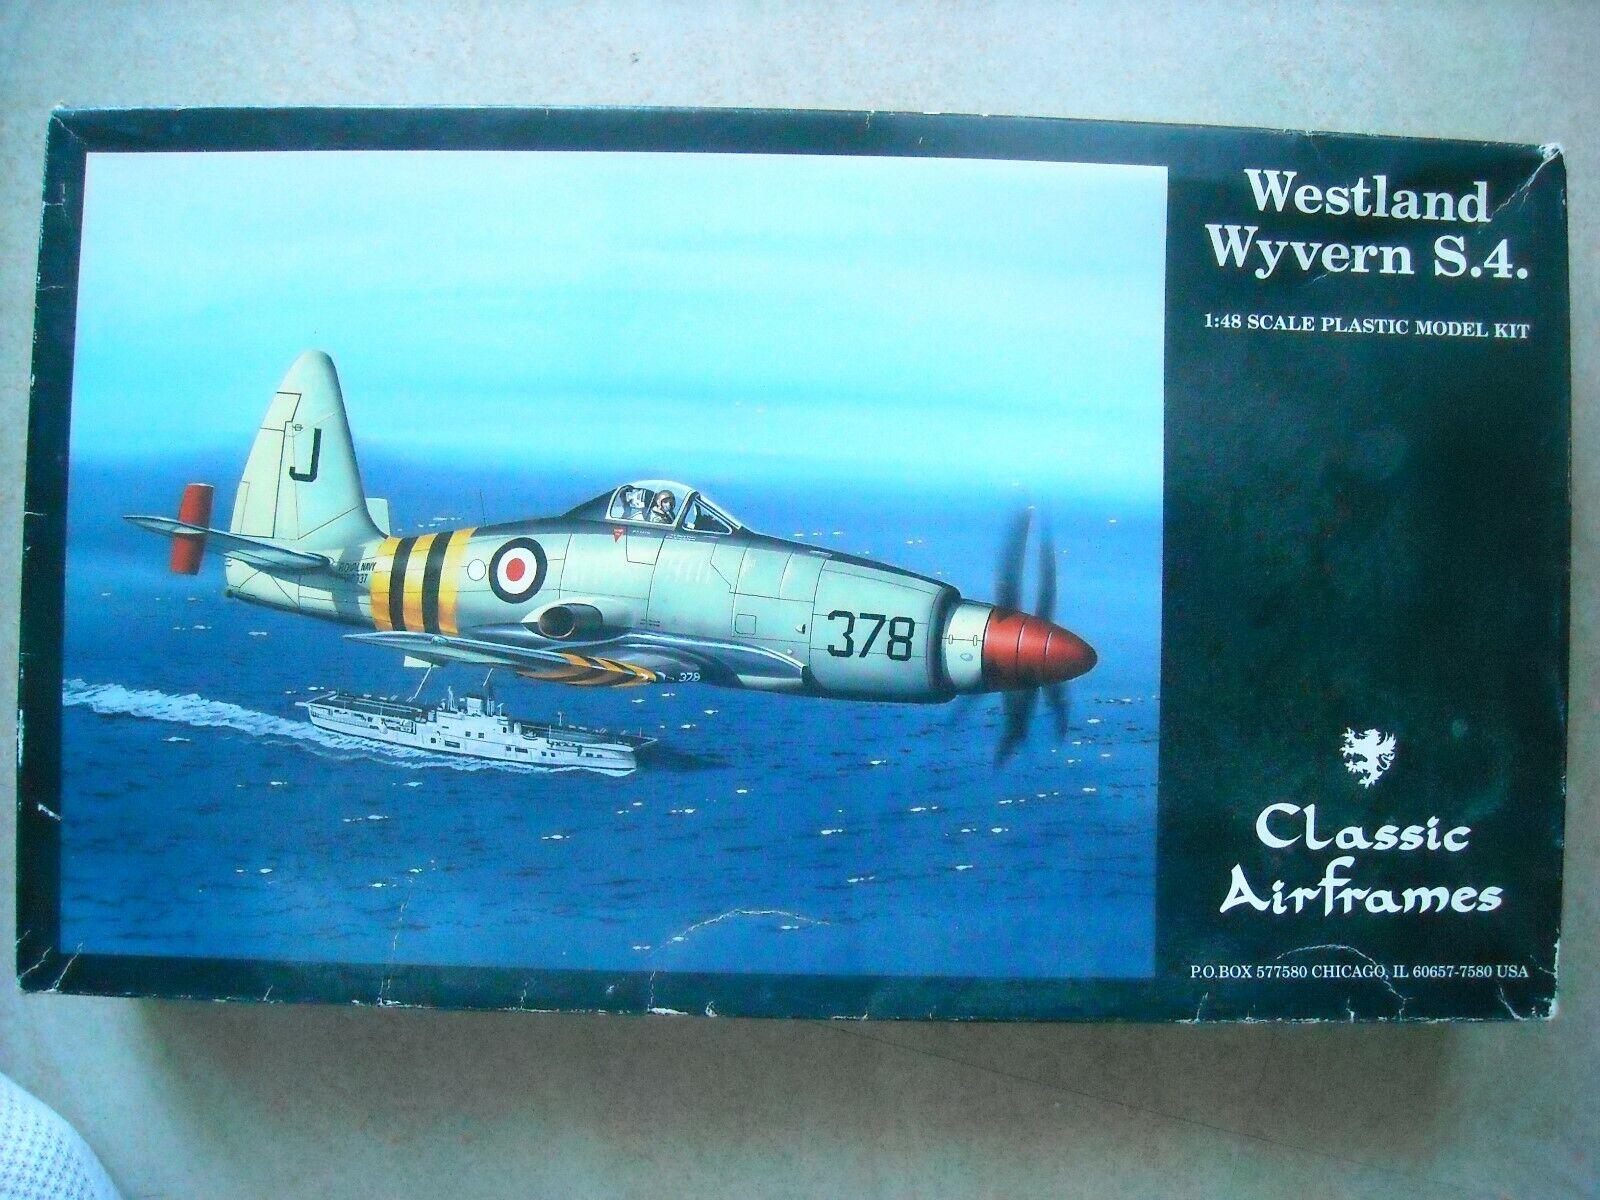 CLASSIC AIRFRAMES-1 48-WESTLAND WYVERN S.4